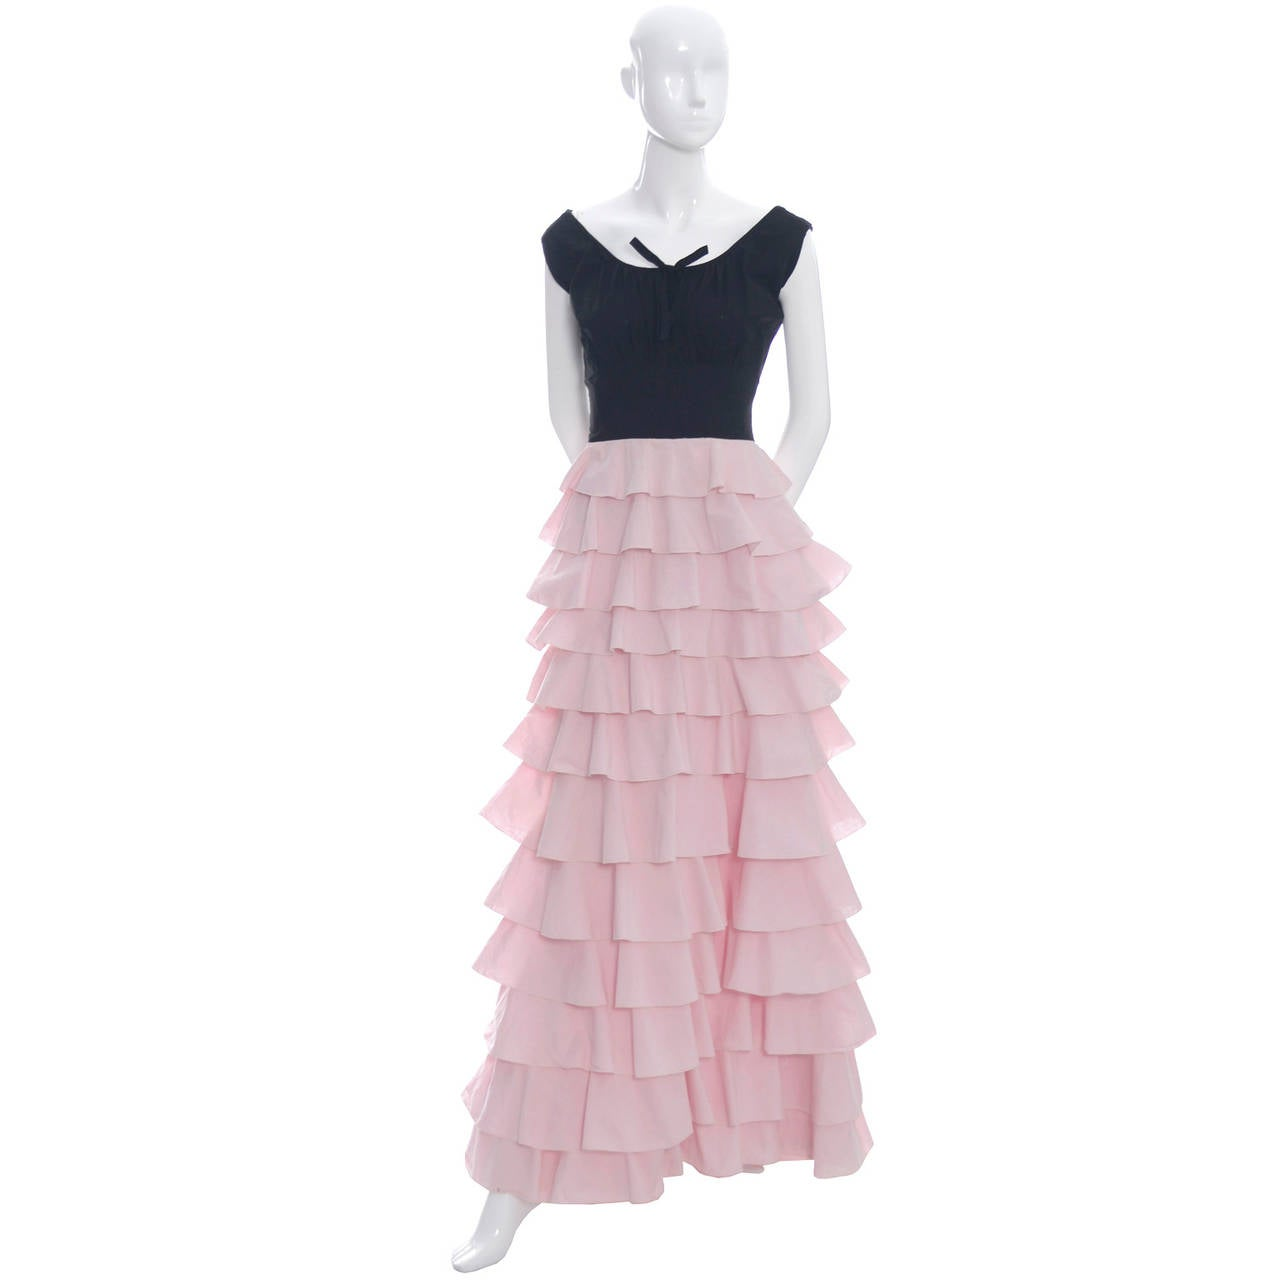 1940s Vintage Gilbert Adrian Original Dress Pink Ruffles Rare Designer Gown 3